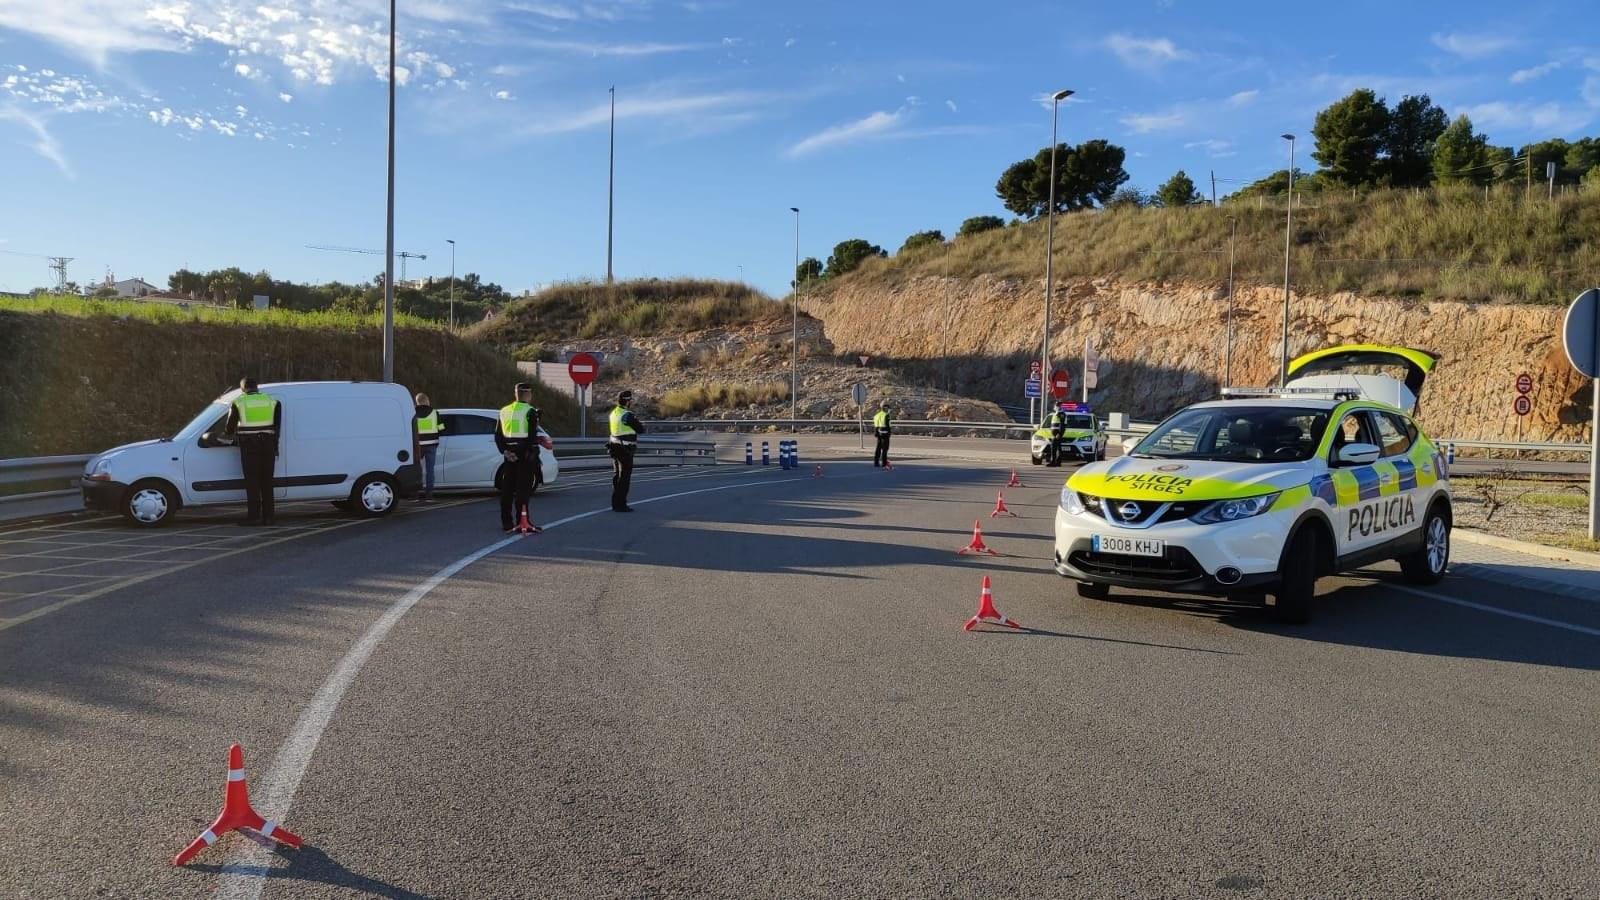 La Policia local imposa 111 sancions per incompliment de mesures anti-COVID19